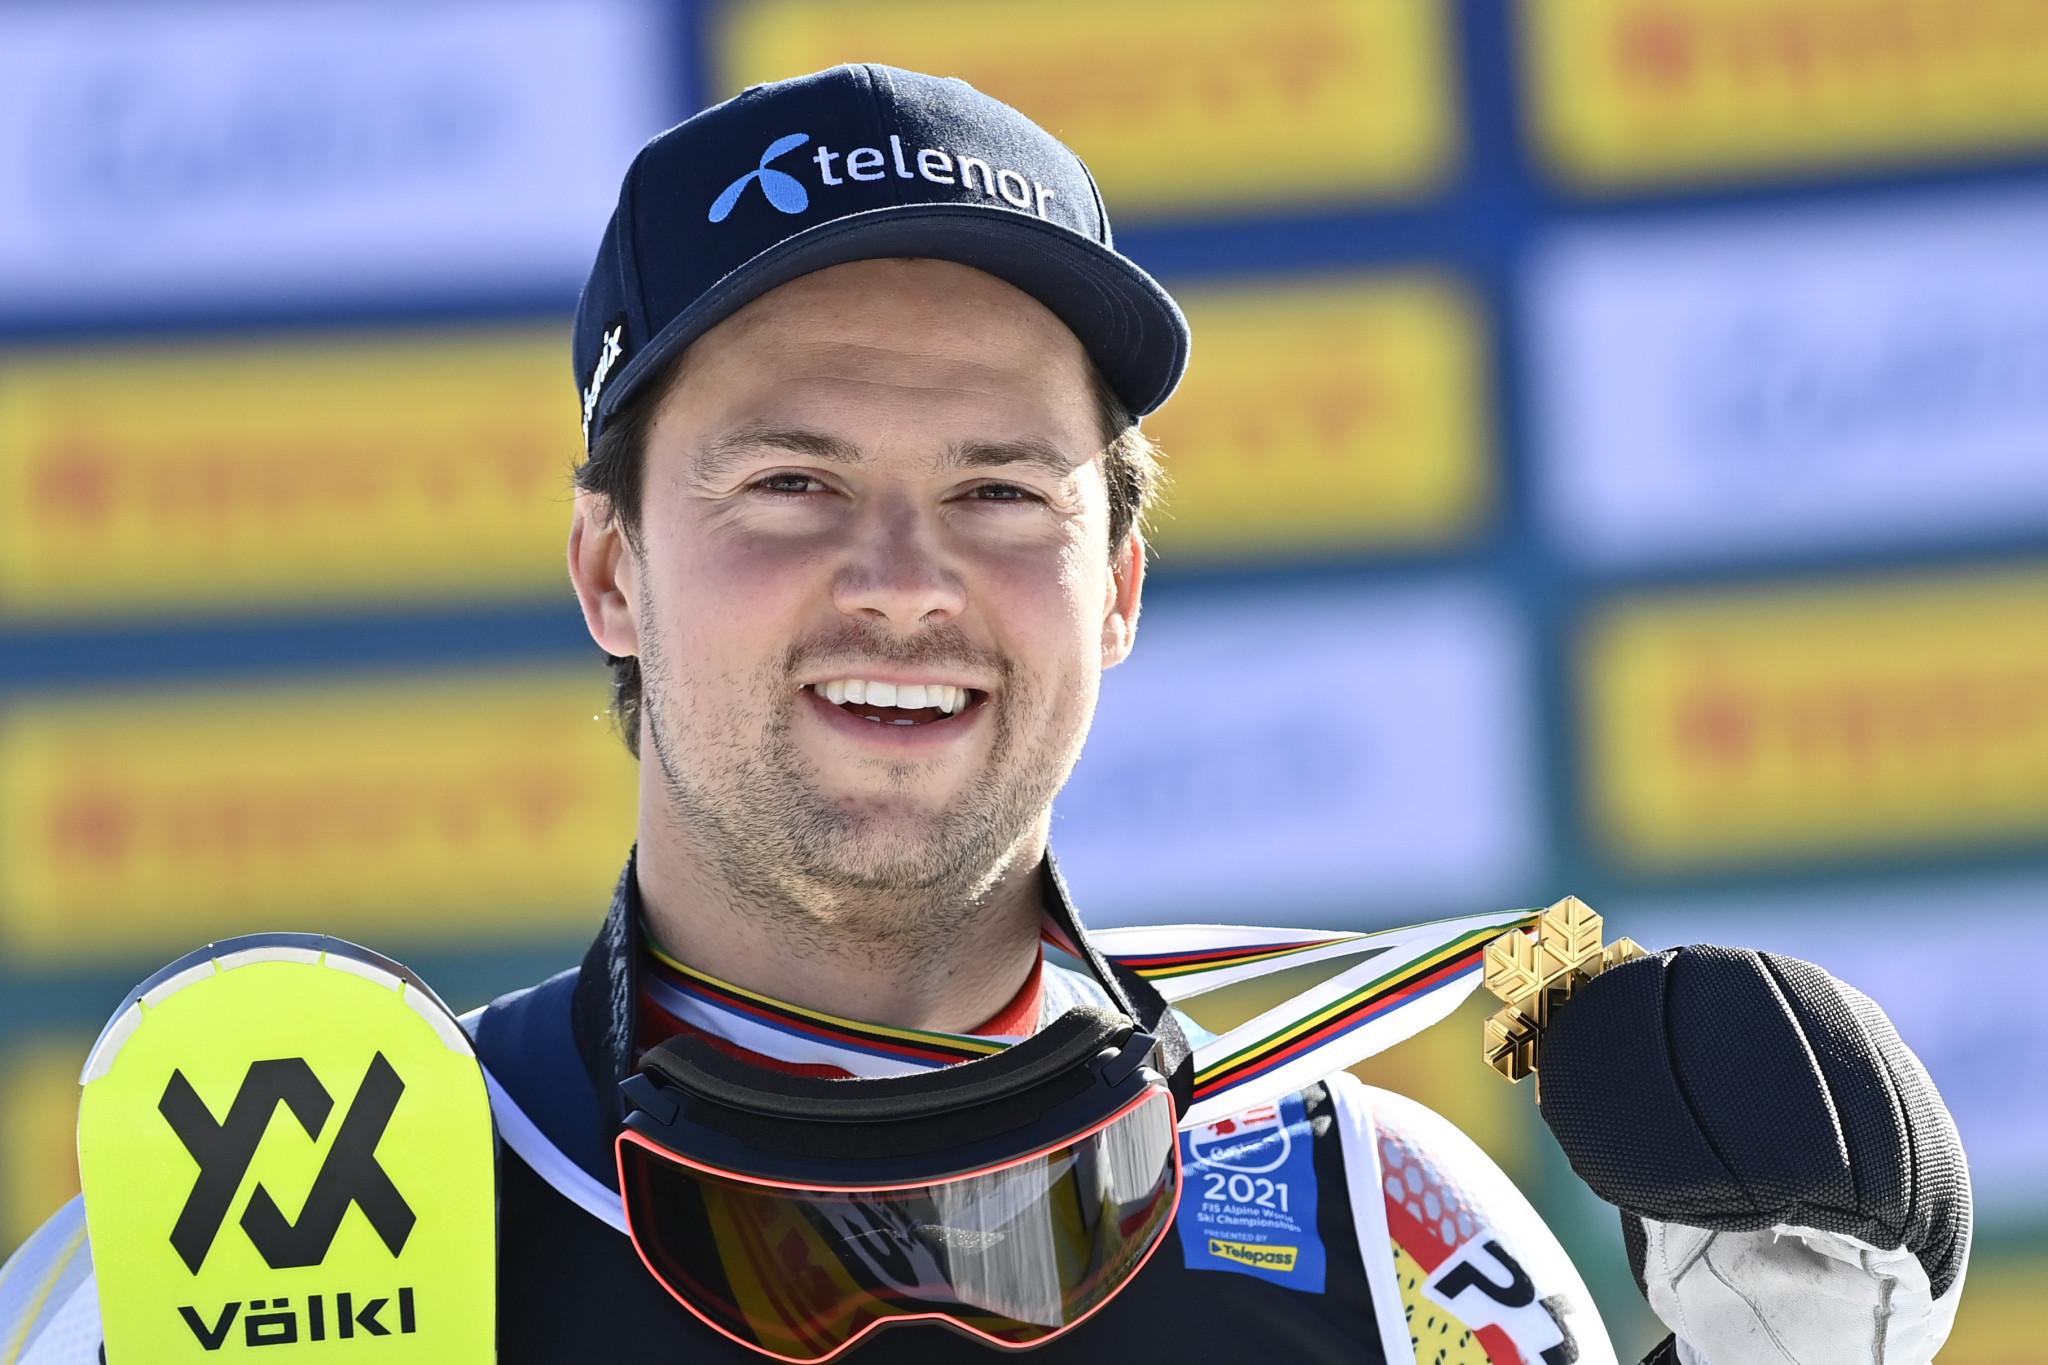 Foss-Solevåg wins slalom as FIS Alpine Ski World Championships conclude